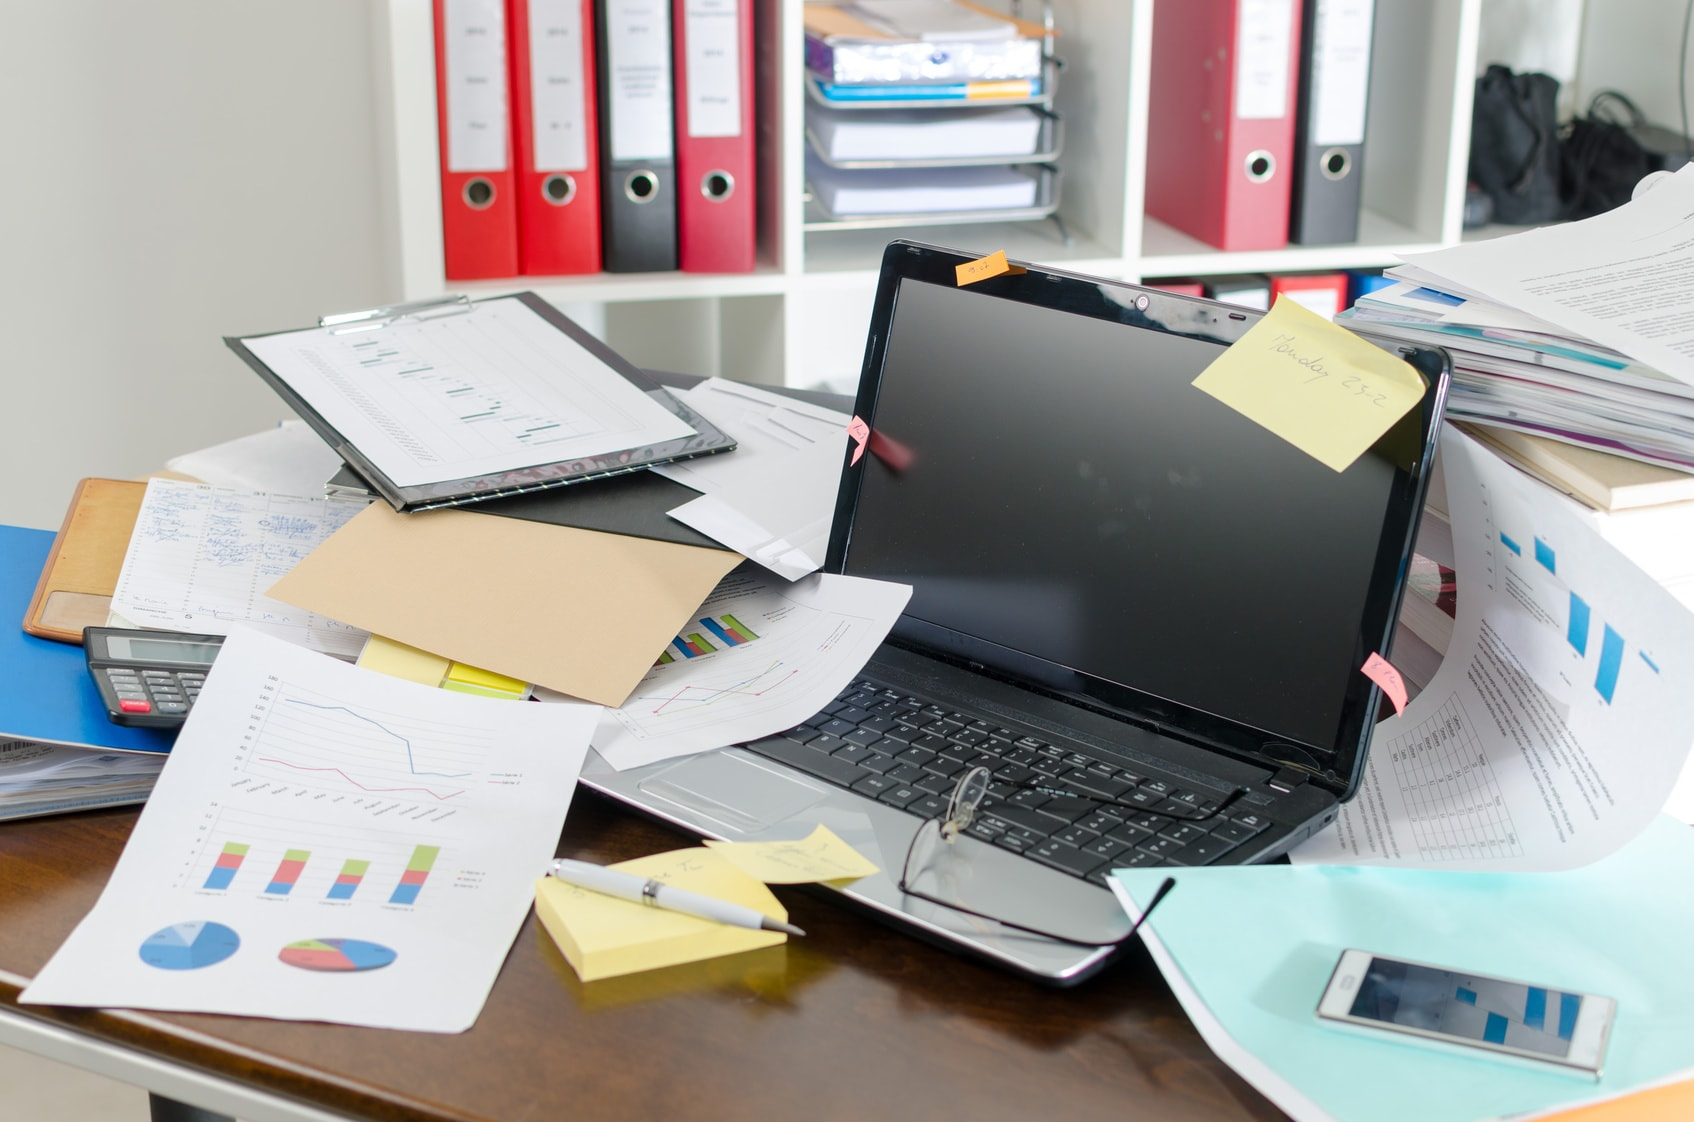 Chaos am Arbeitsplatz